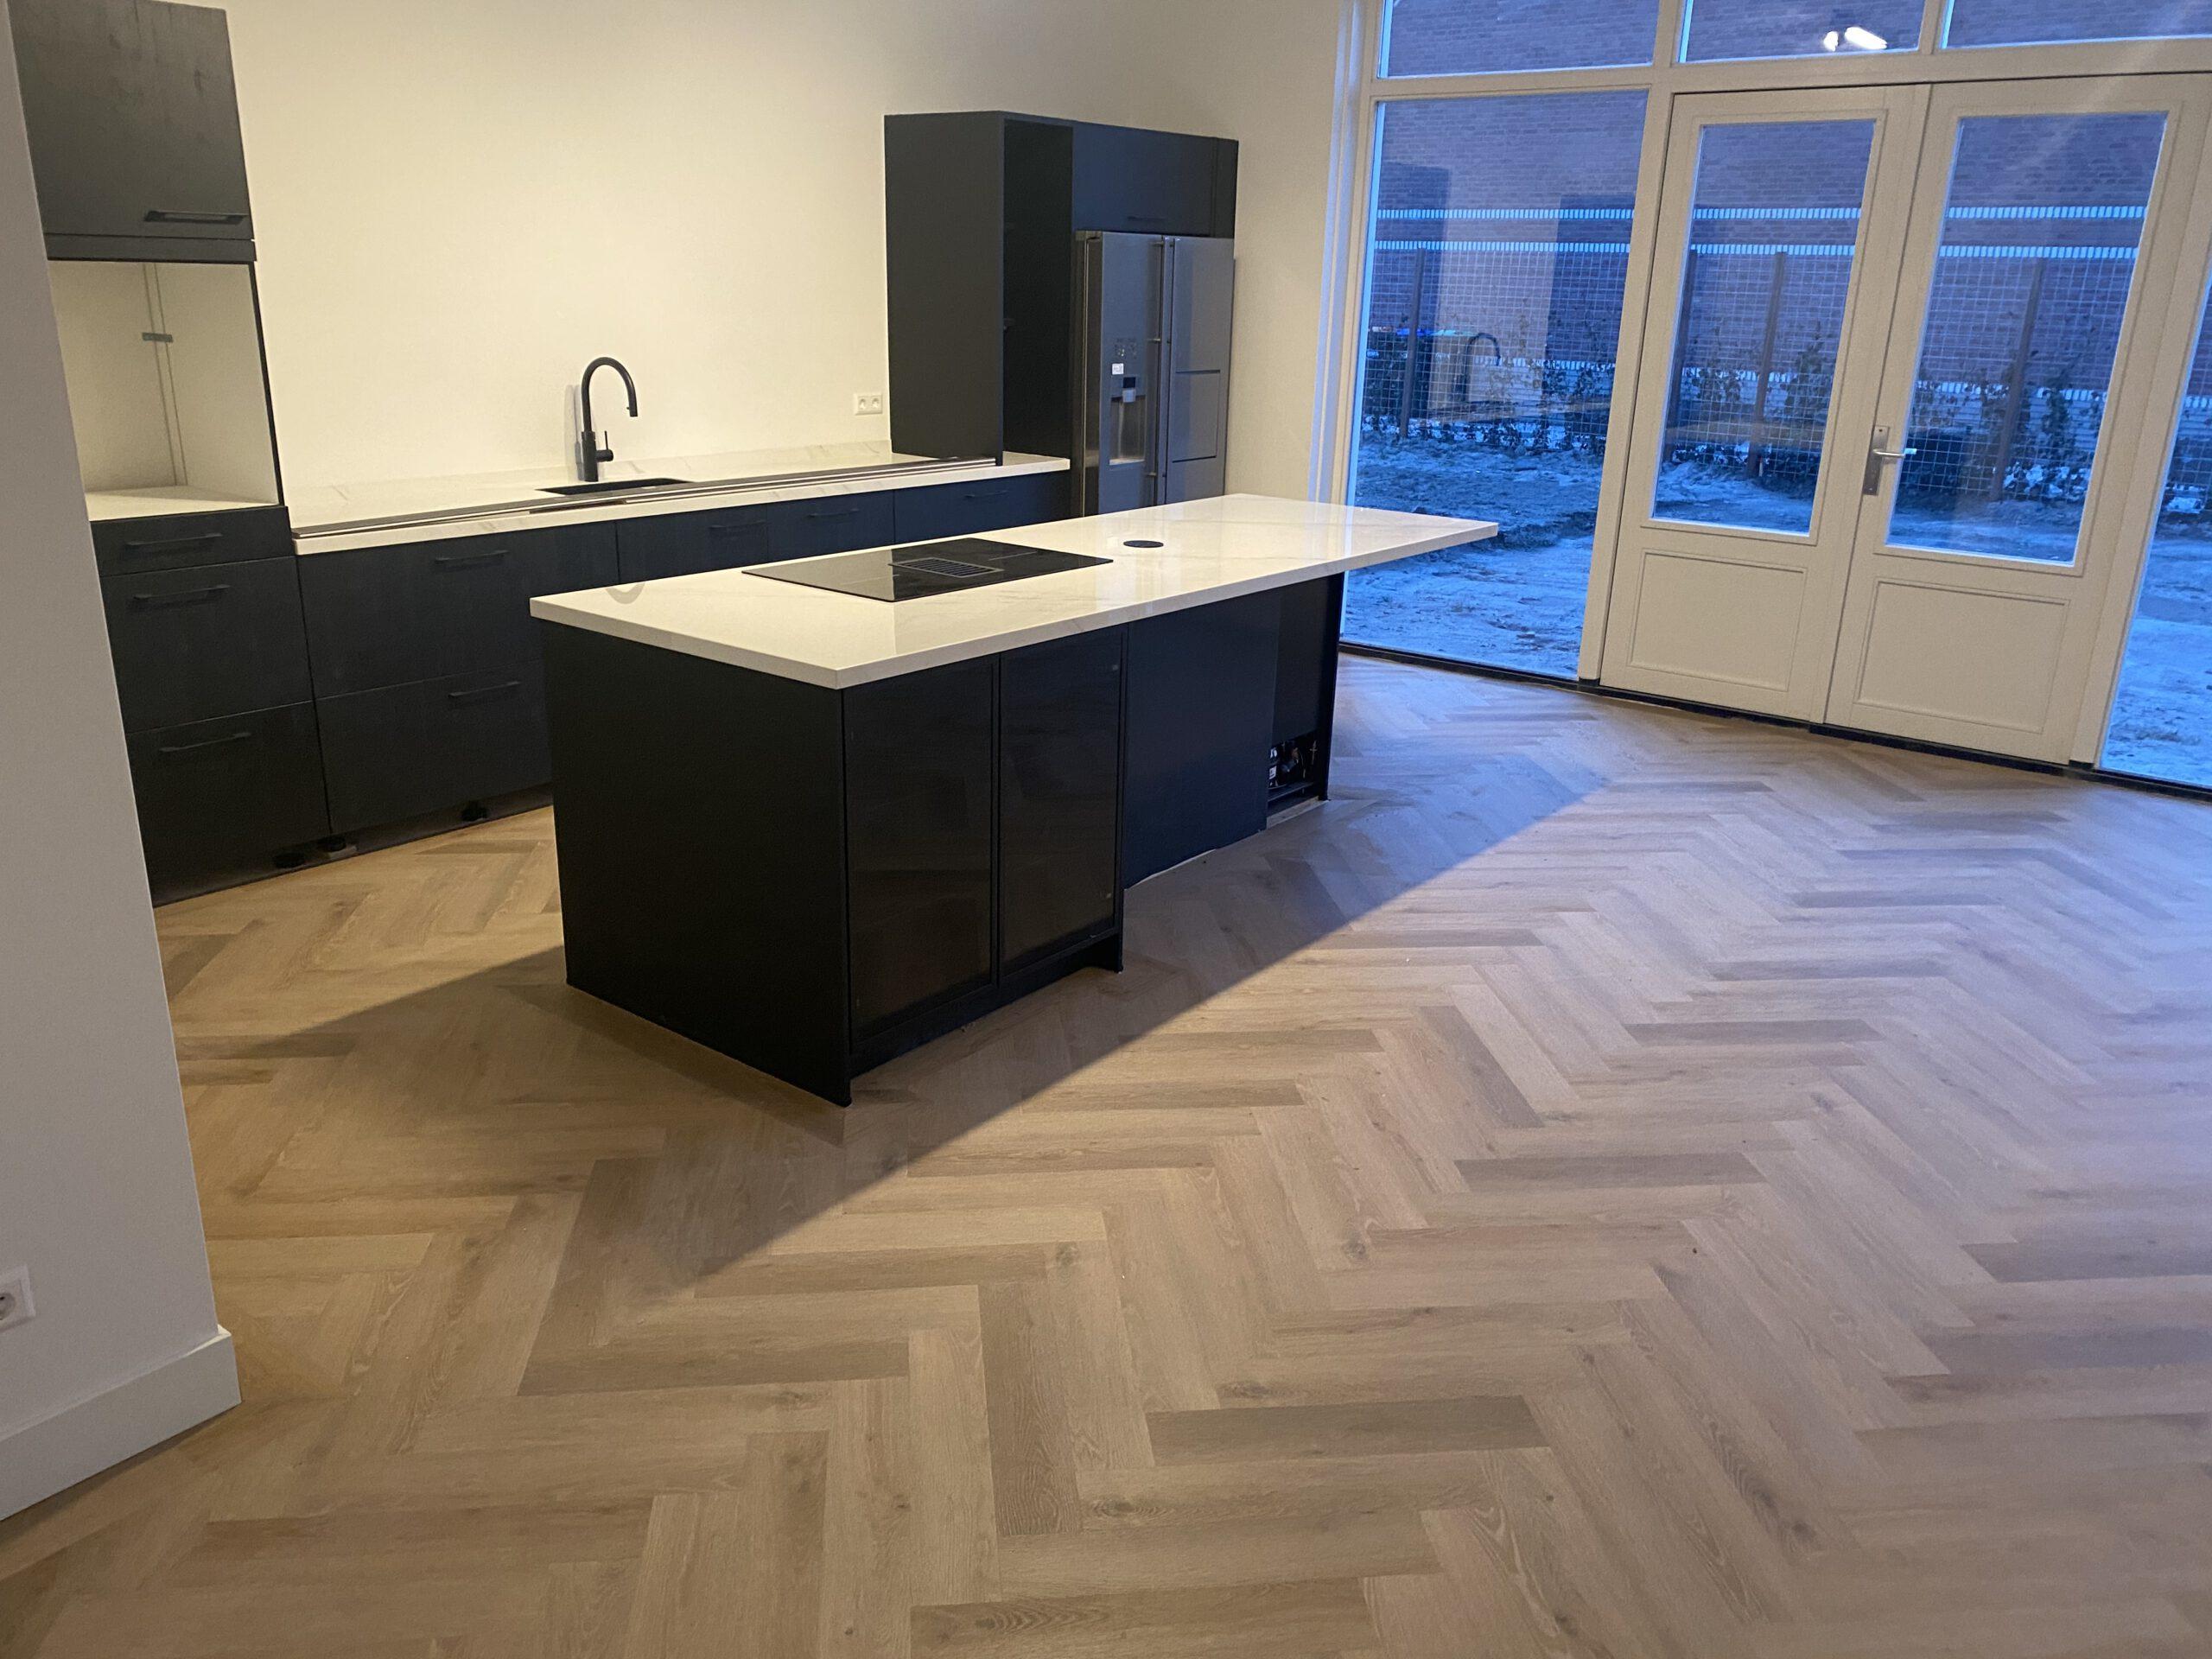 PVC Visgraatvloer gelegd open keuken